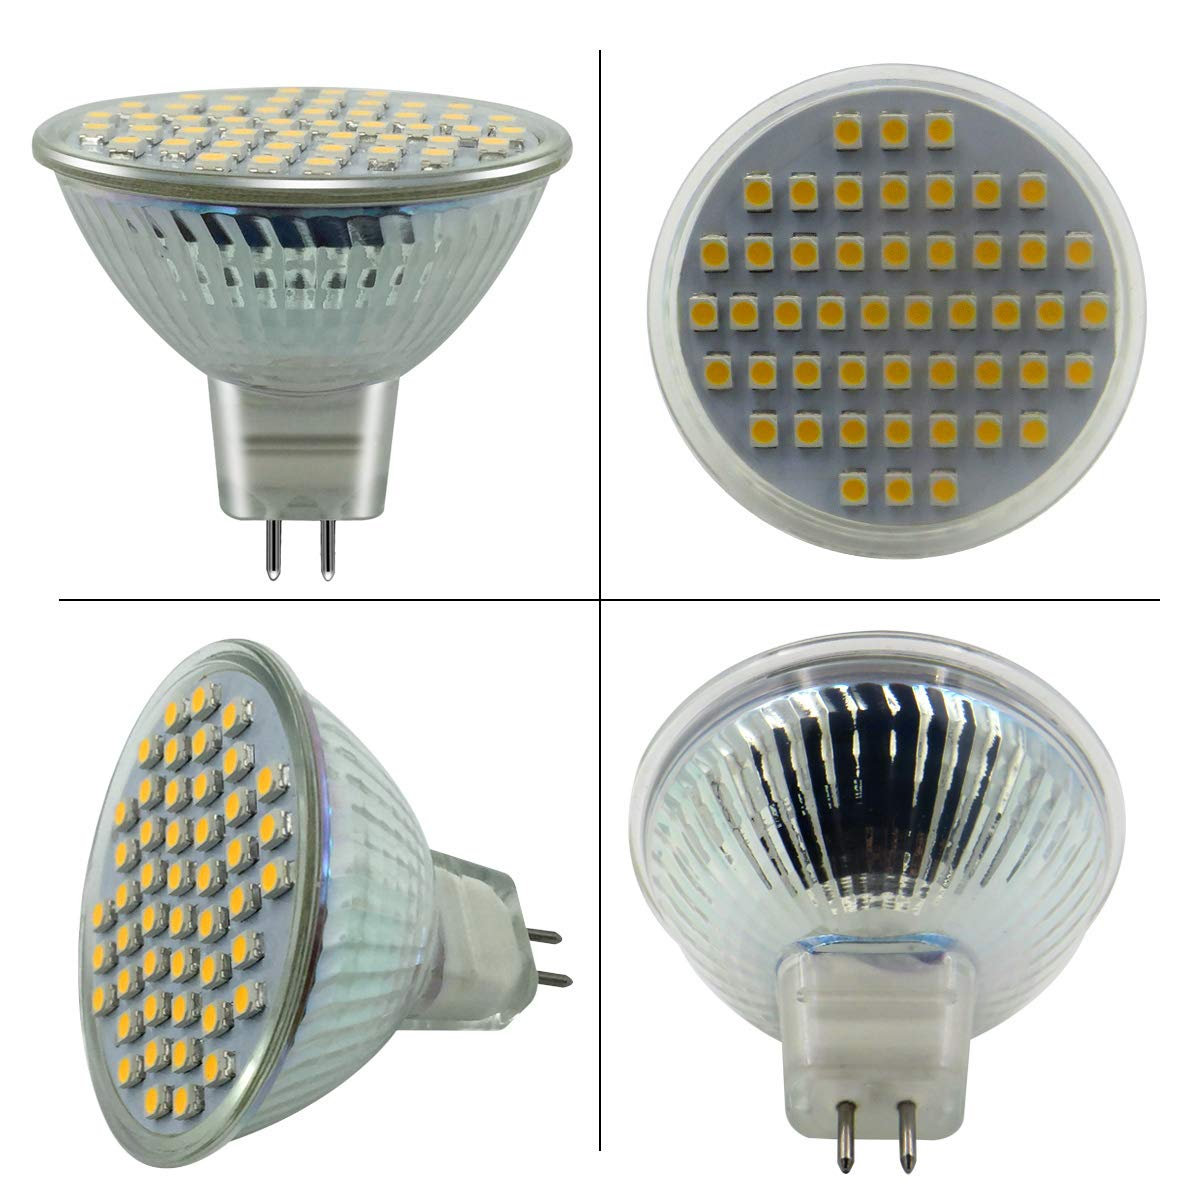 40 Degree Beam Angle Non-Dimmable 50W Equivalent 400 Lumens MR16 GU5.3 Base Warm White GU5.3 Spot Light Bulb Pack of 6 AC//DC 12V 5W Warm White 3000K ZhenMingPhotoelectric MR16 GU5.3 LED Light Bulbs